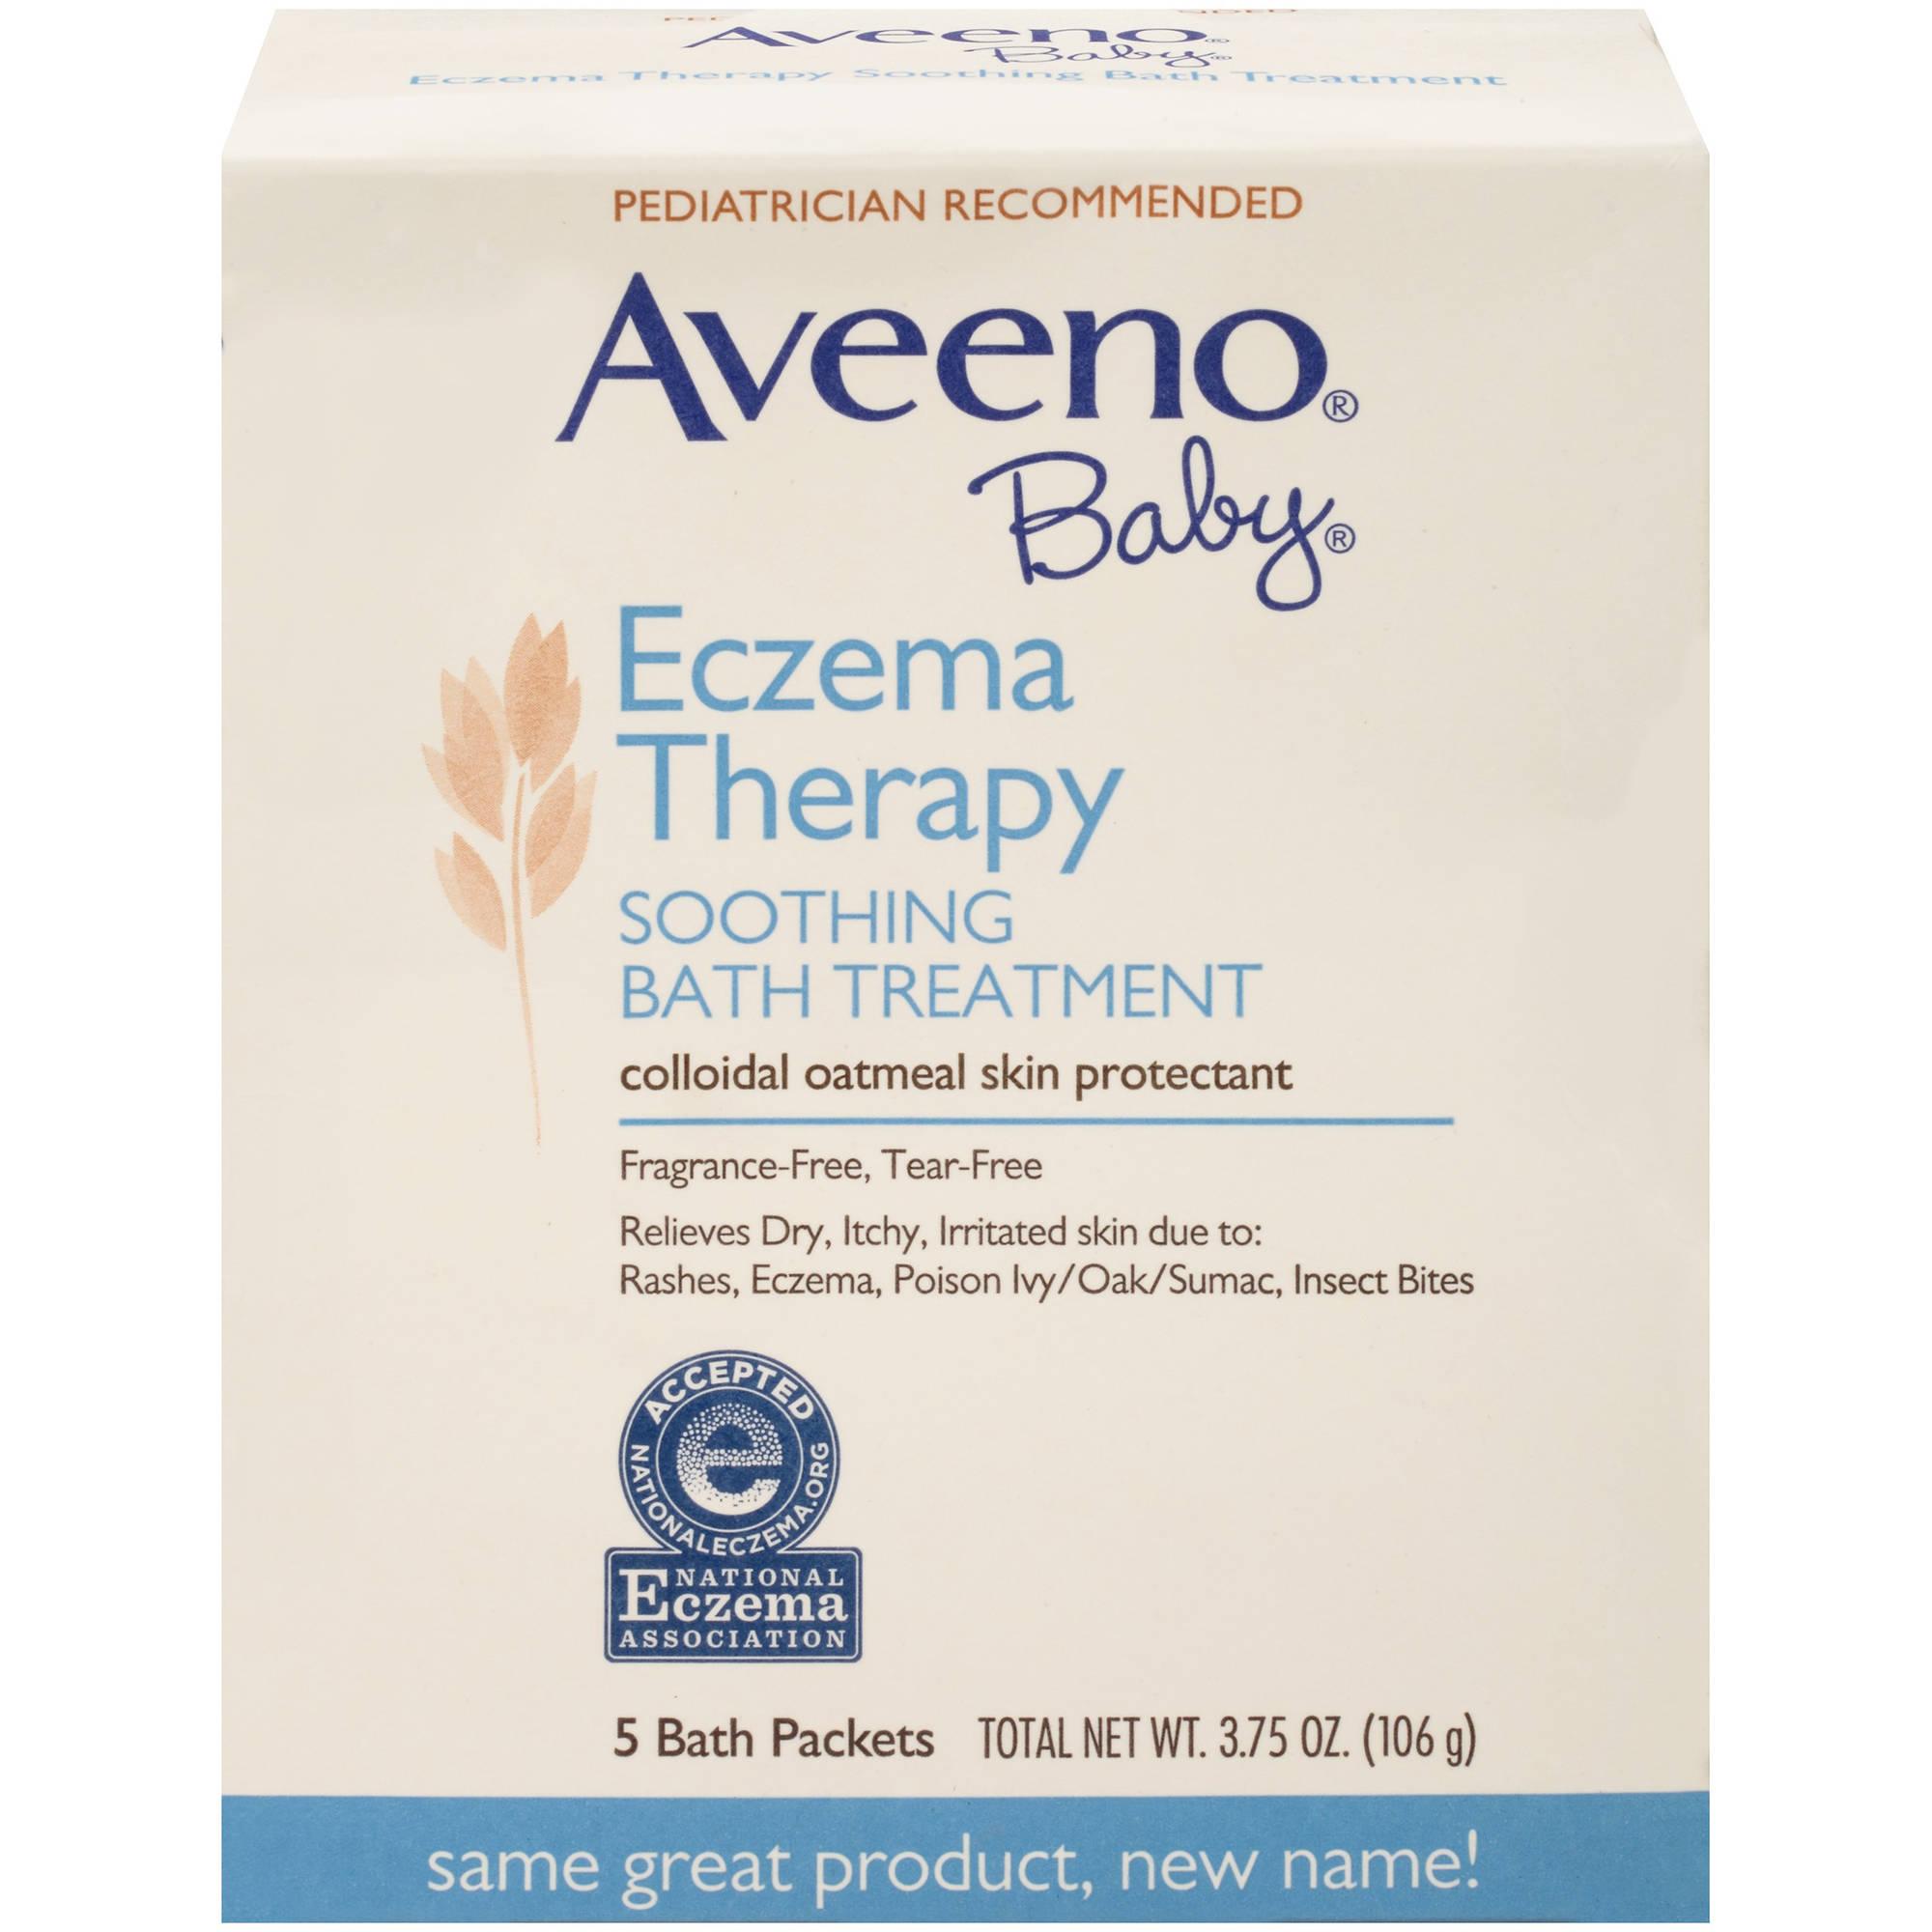 Oatmeal bath for eczema in babies